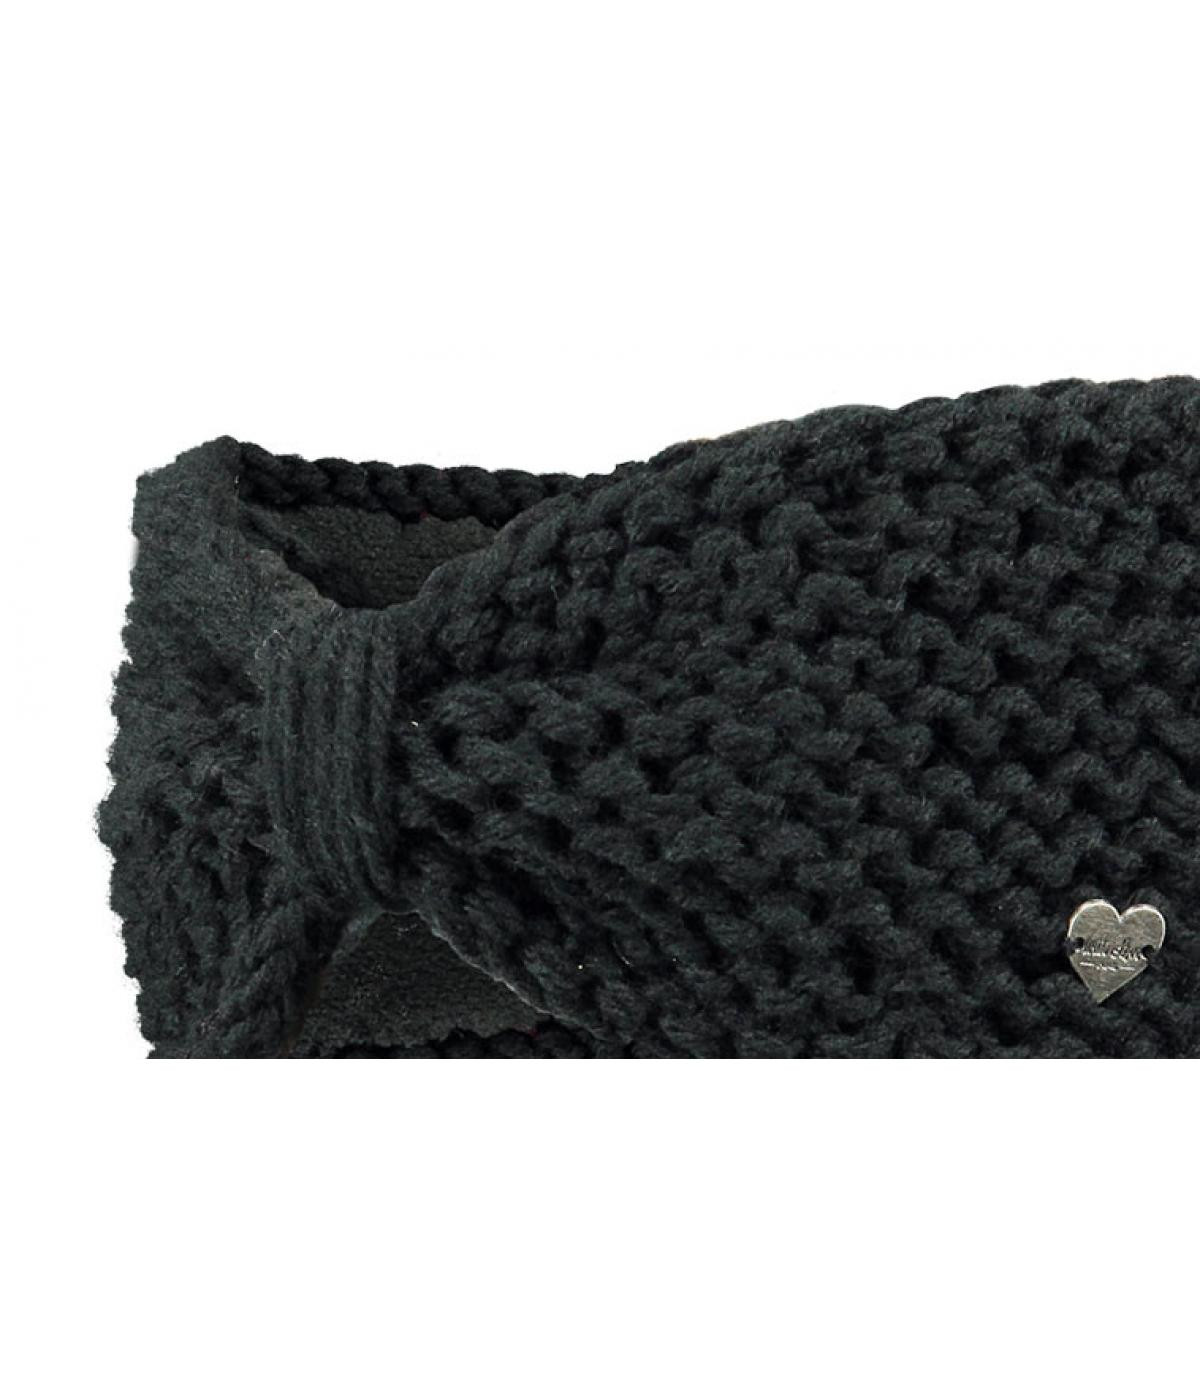 Dettagli Ginger headband black - image 2